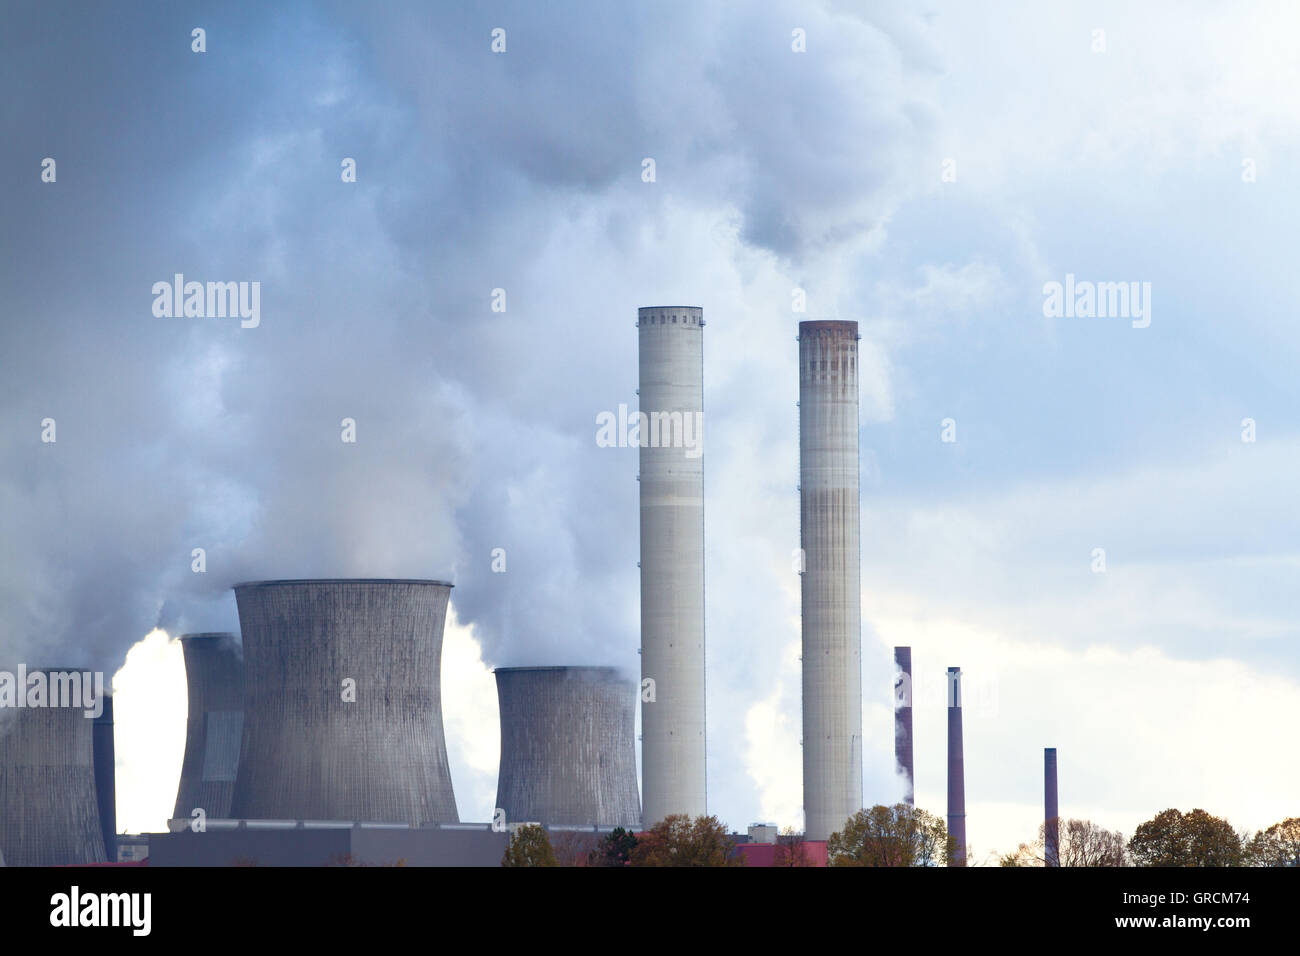 Coal Power Plant Niederaussem, Nrw - Stock Image